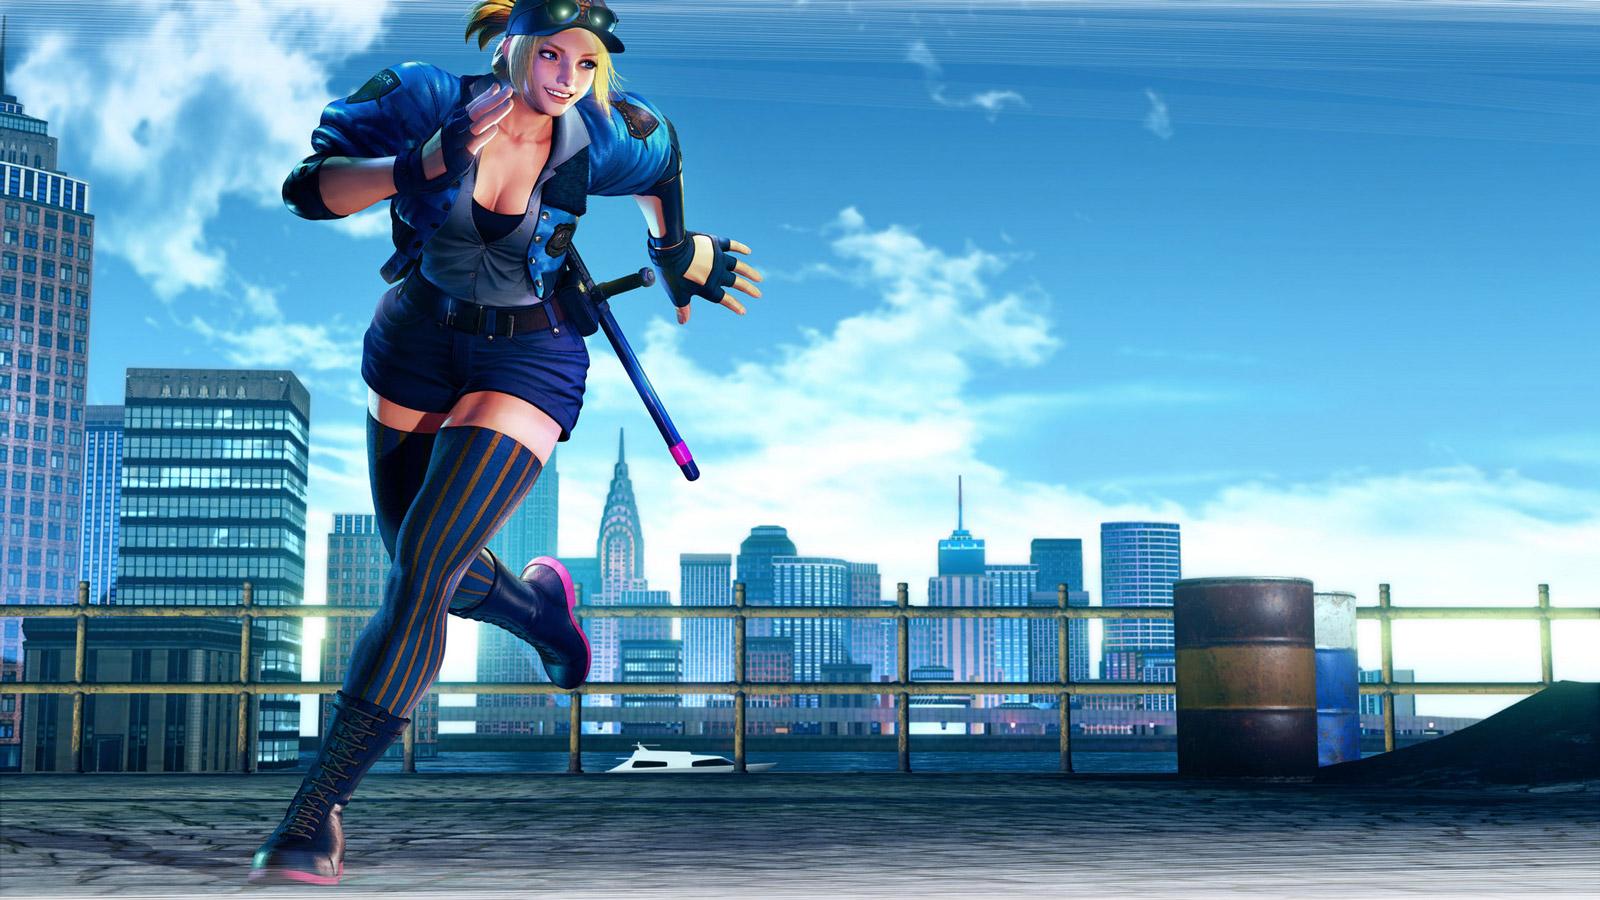 Free Street Fighter V Wallpaper in 1600x900